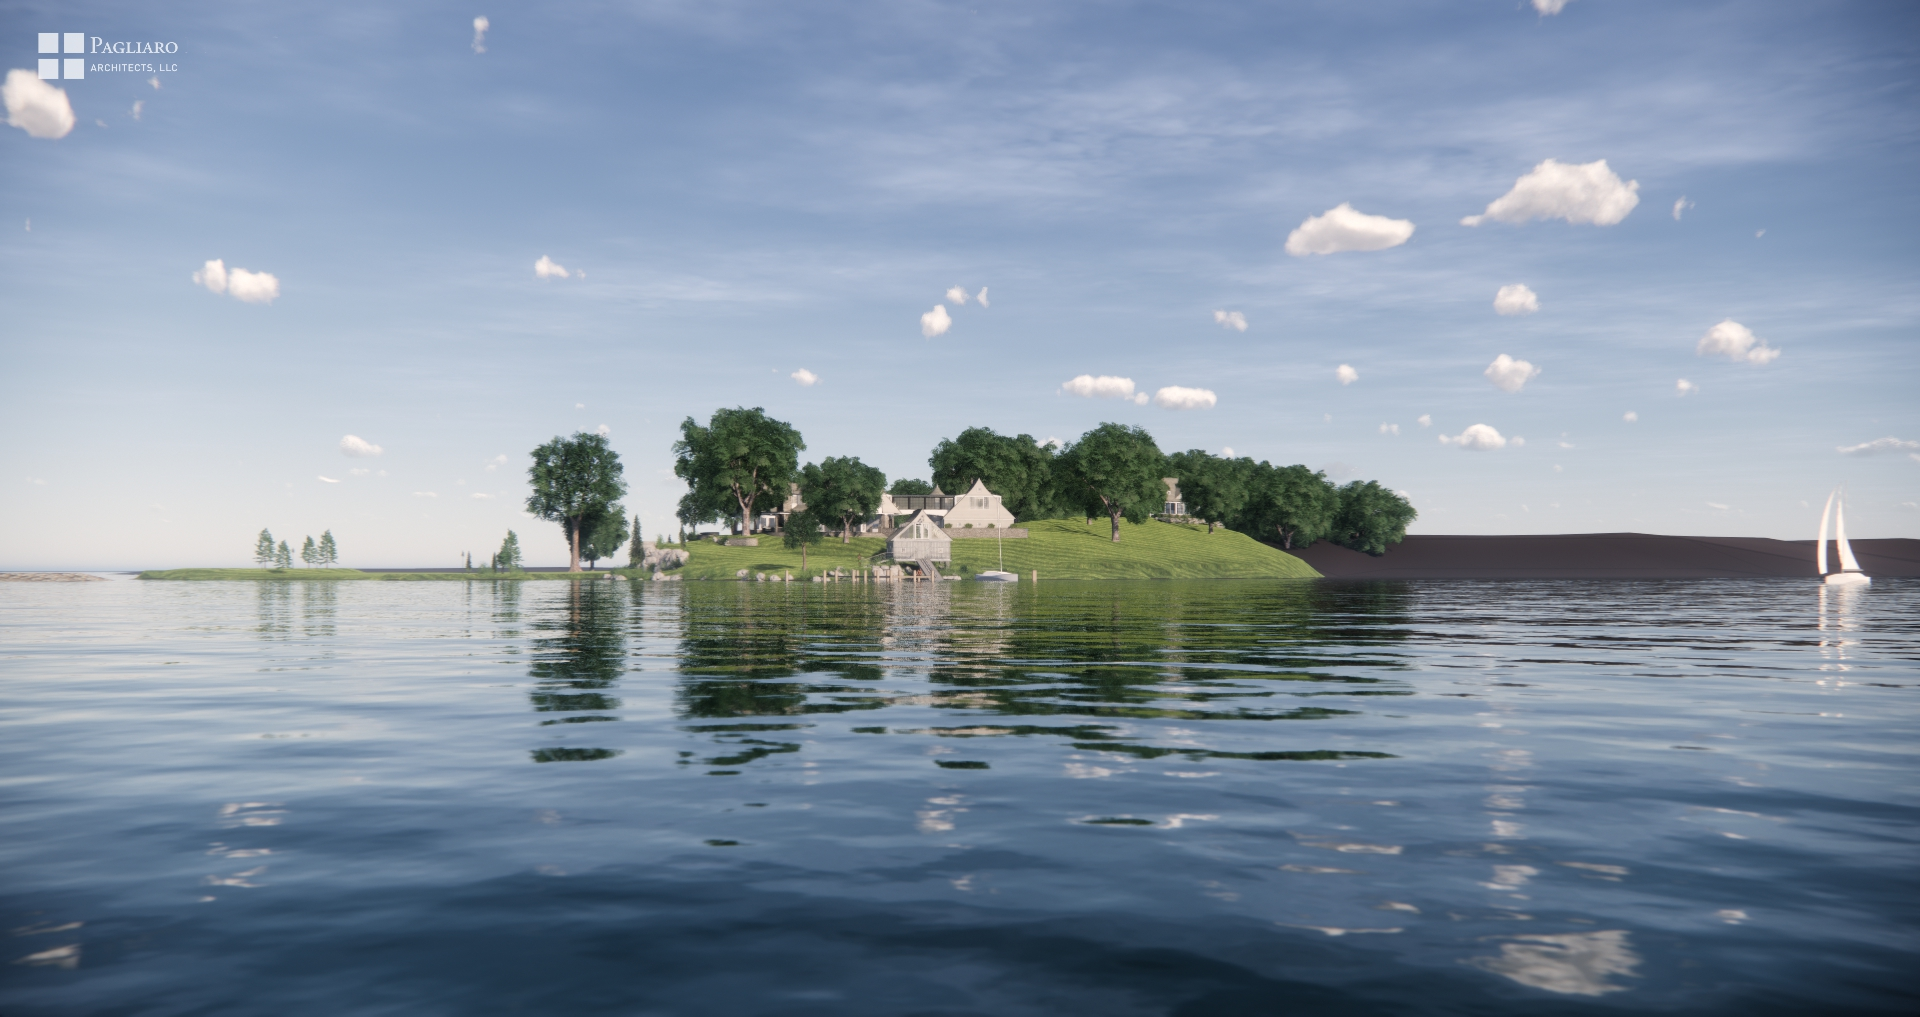 33-35 Money Point - 2019.07.10 Boat House Exterior 05.jpg